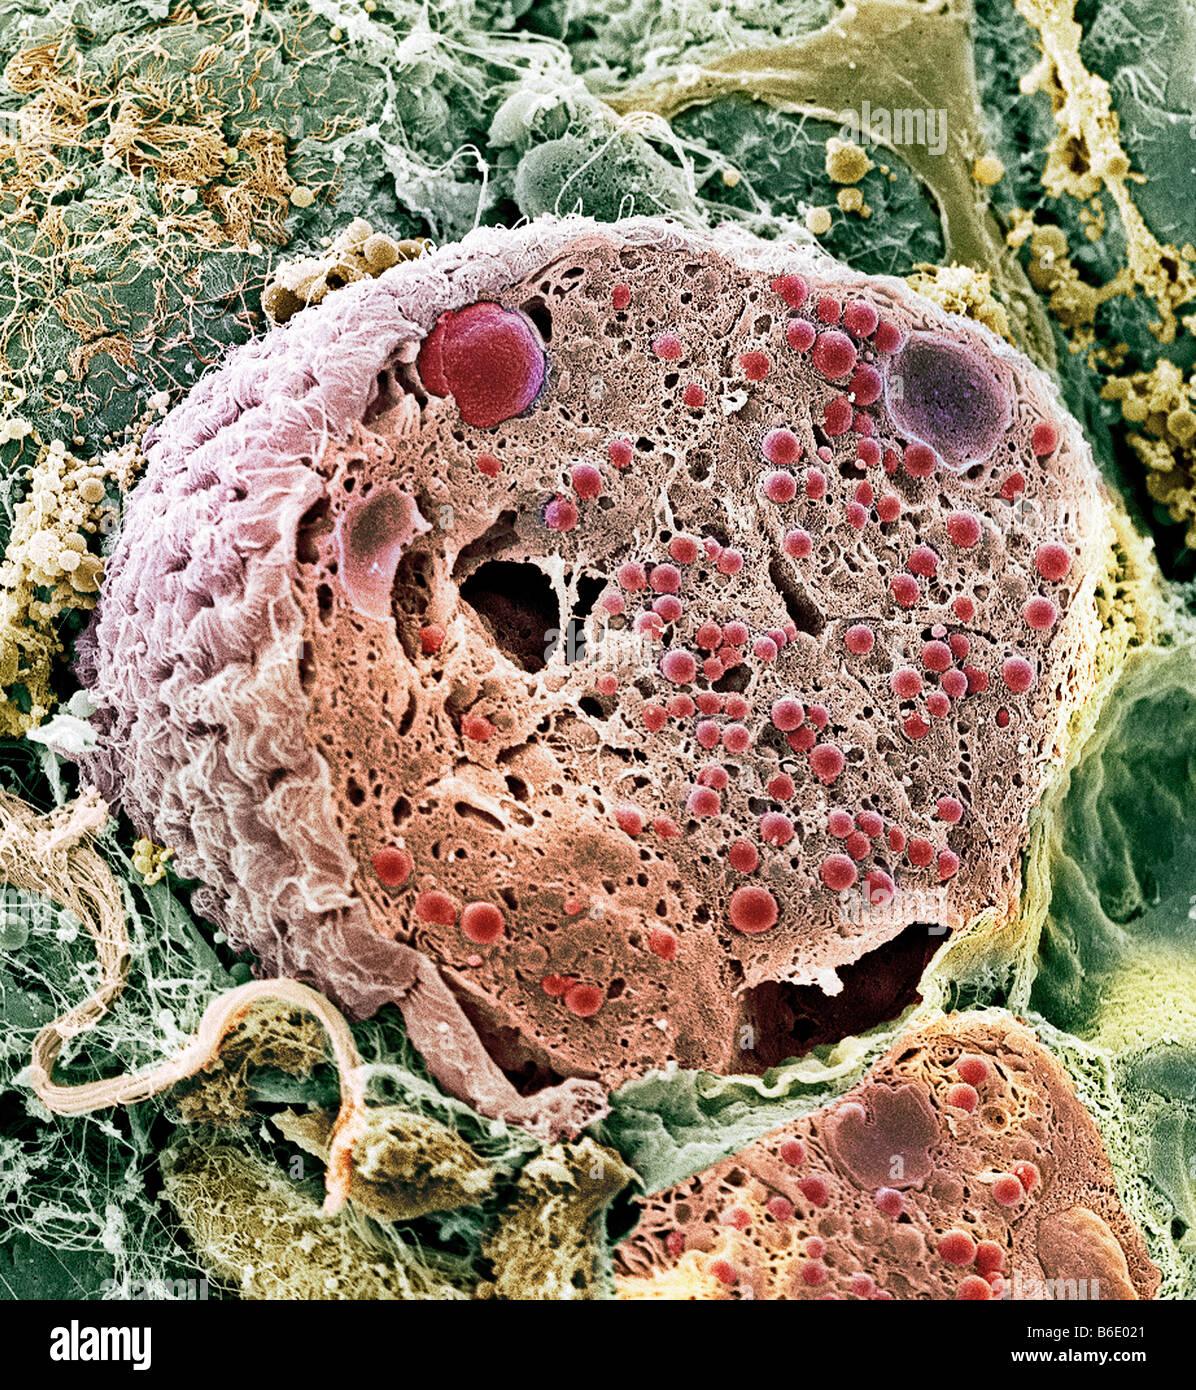 Bauchspeicheldrüse Zelle, farbigen Scan Electronmicrograph (SEM ...